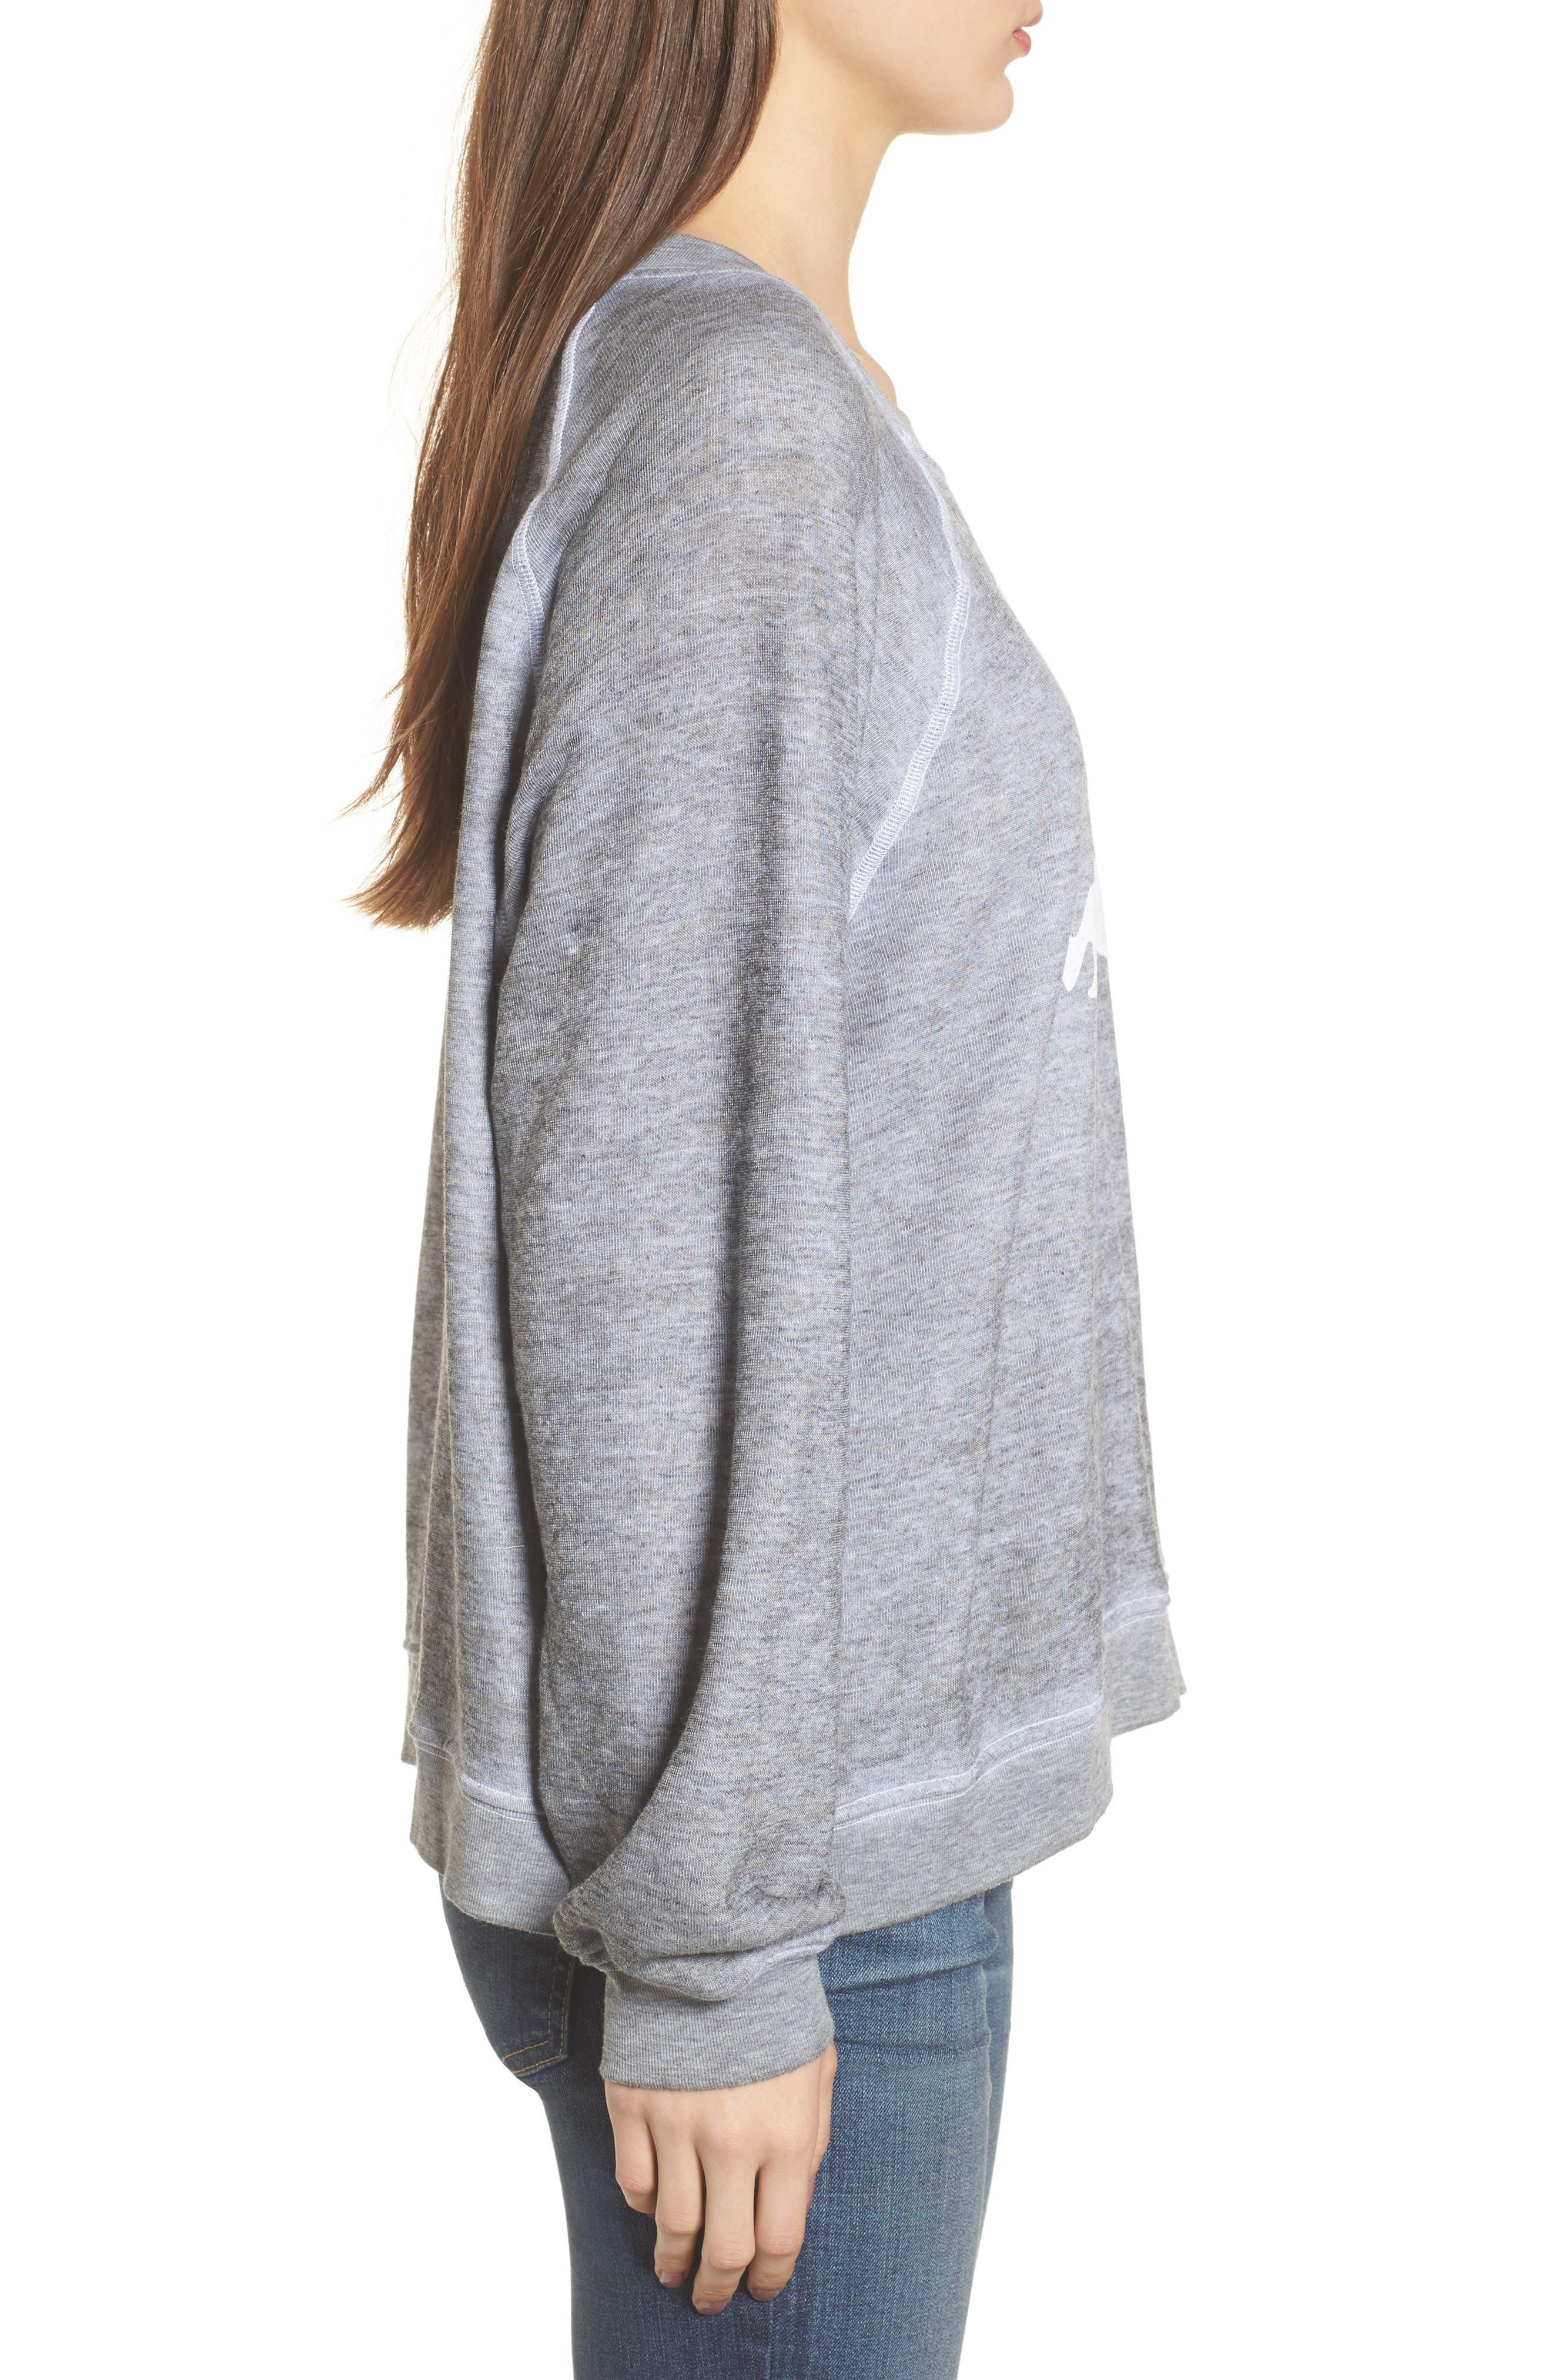 I Love My Dog - Sommers Sweatshirt,                             Alternate thumbnail 3, color,                             020